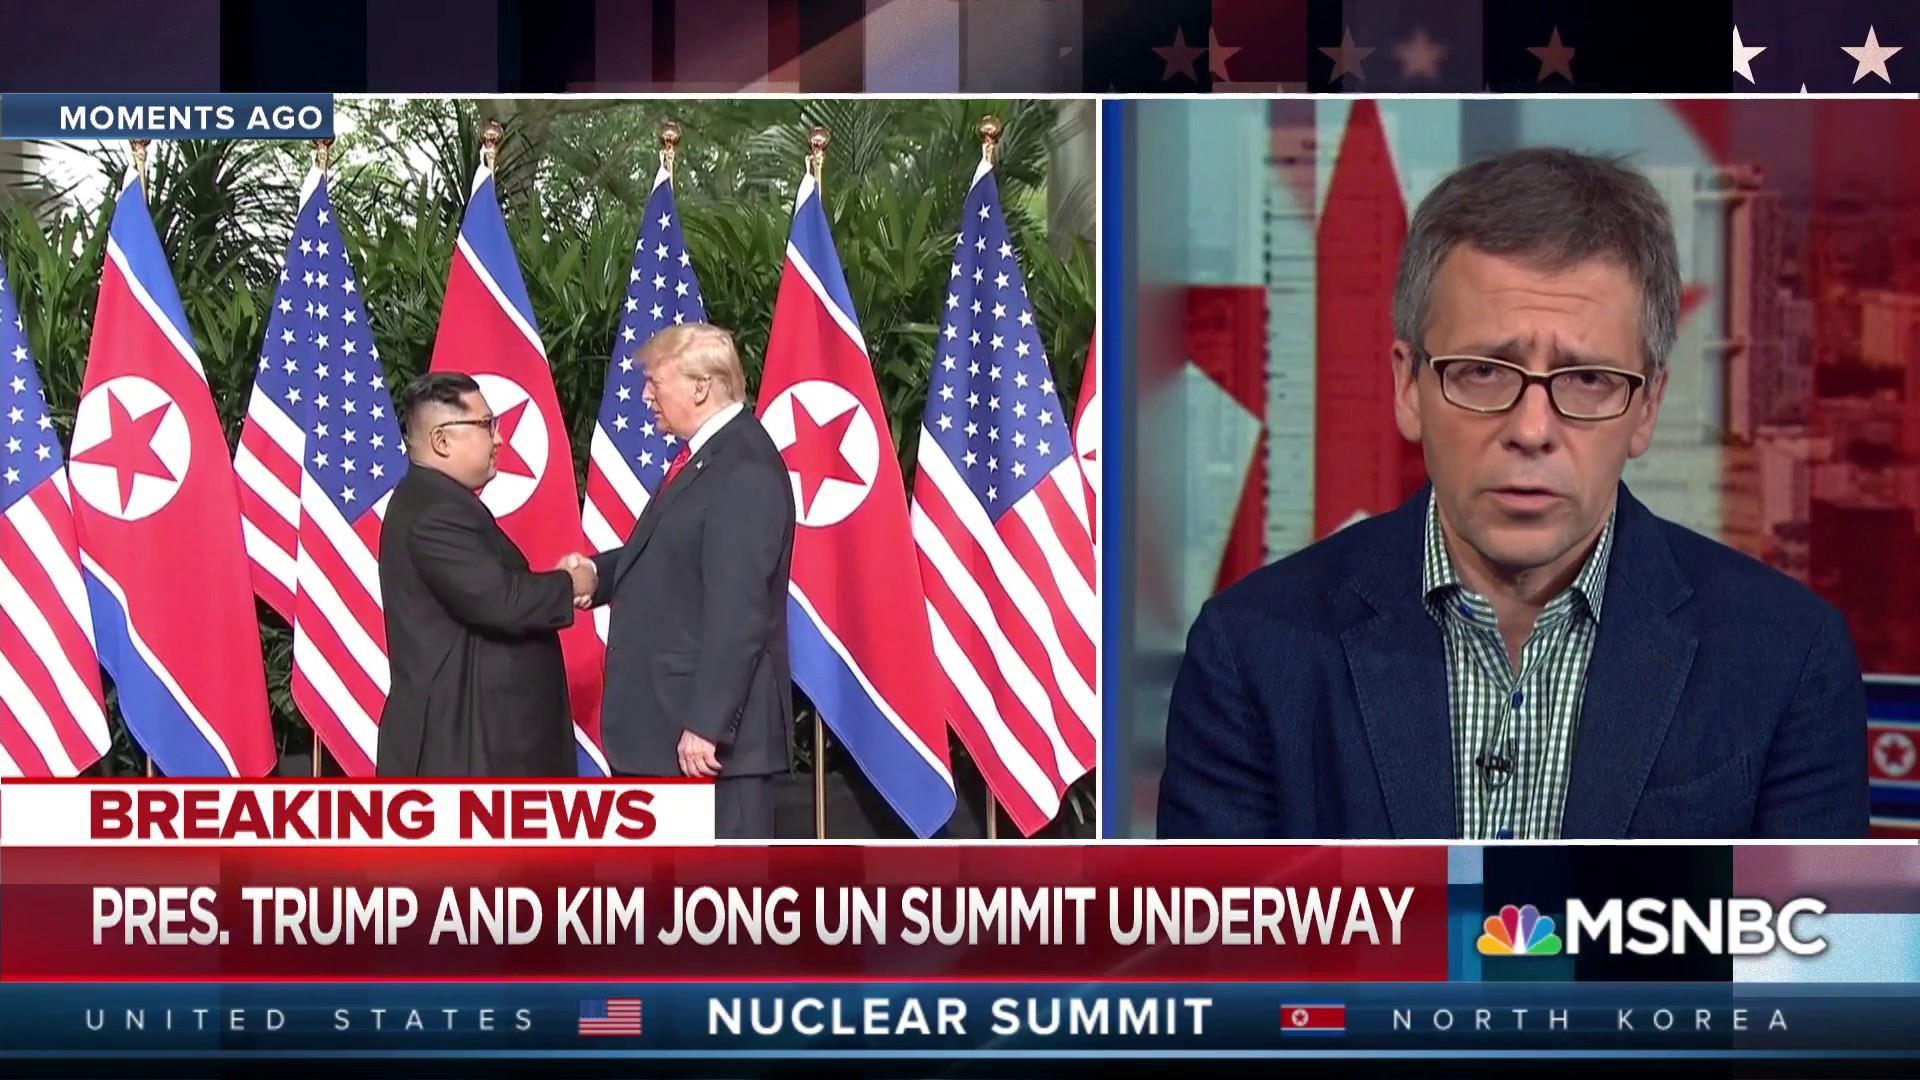 Trump outreach brings Kim Jong Un into world community